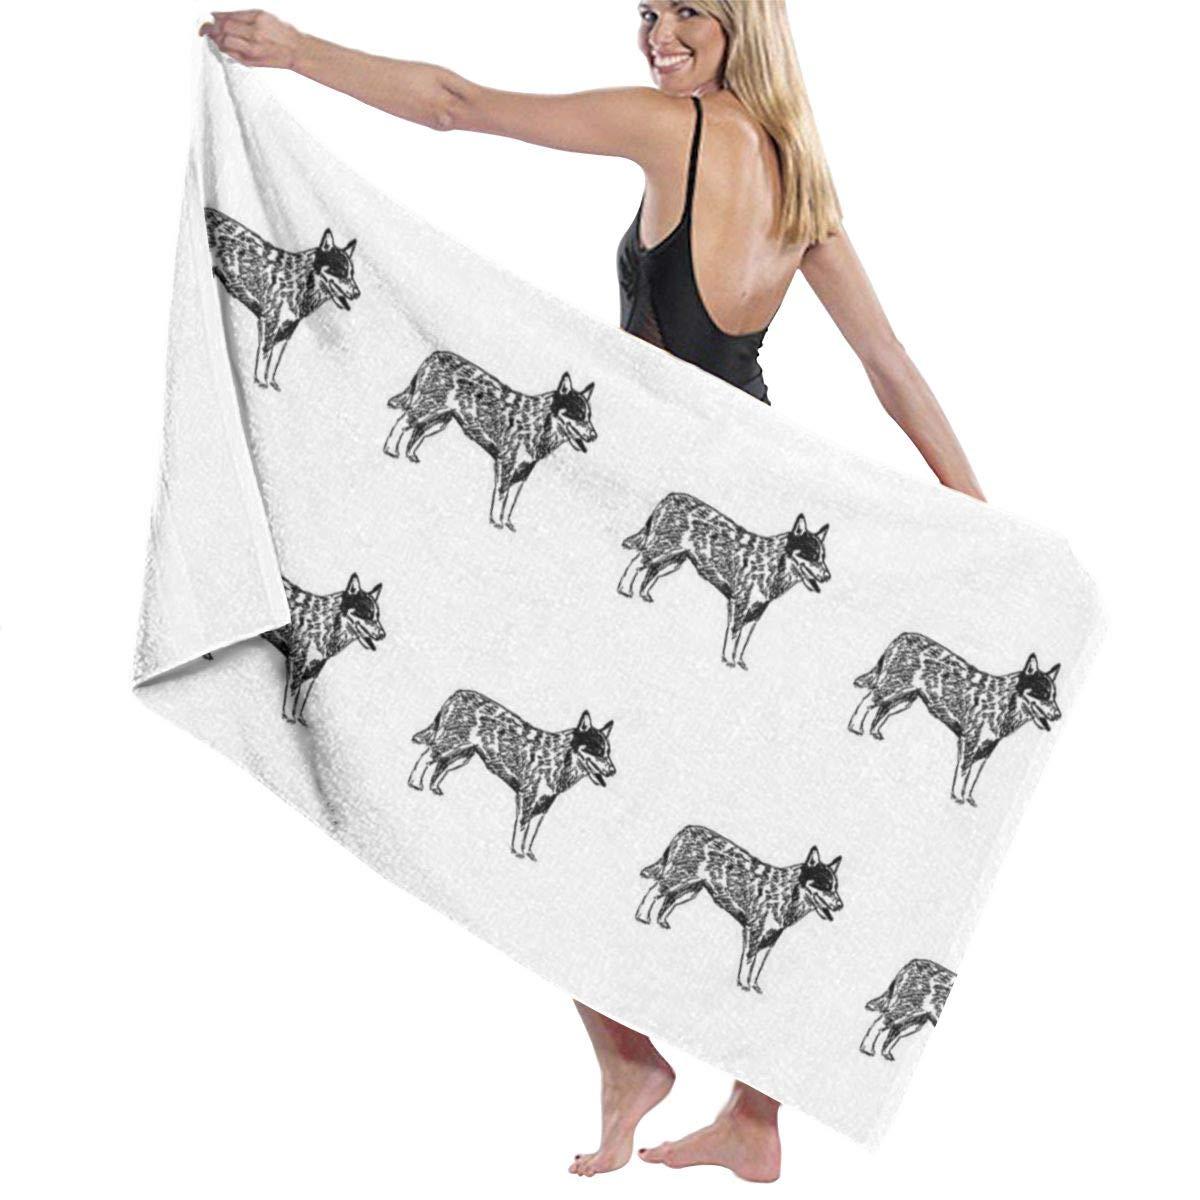 Australian Cattle Dog Dogs Pet Black And White Large Towel Blanket For Travel Pool Swimming Bath Camping Yoga Girl Women Men 32 X 52 Inch